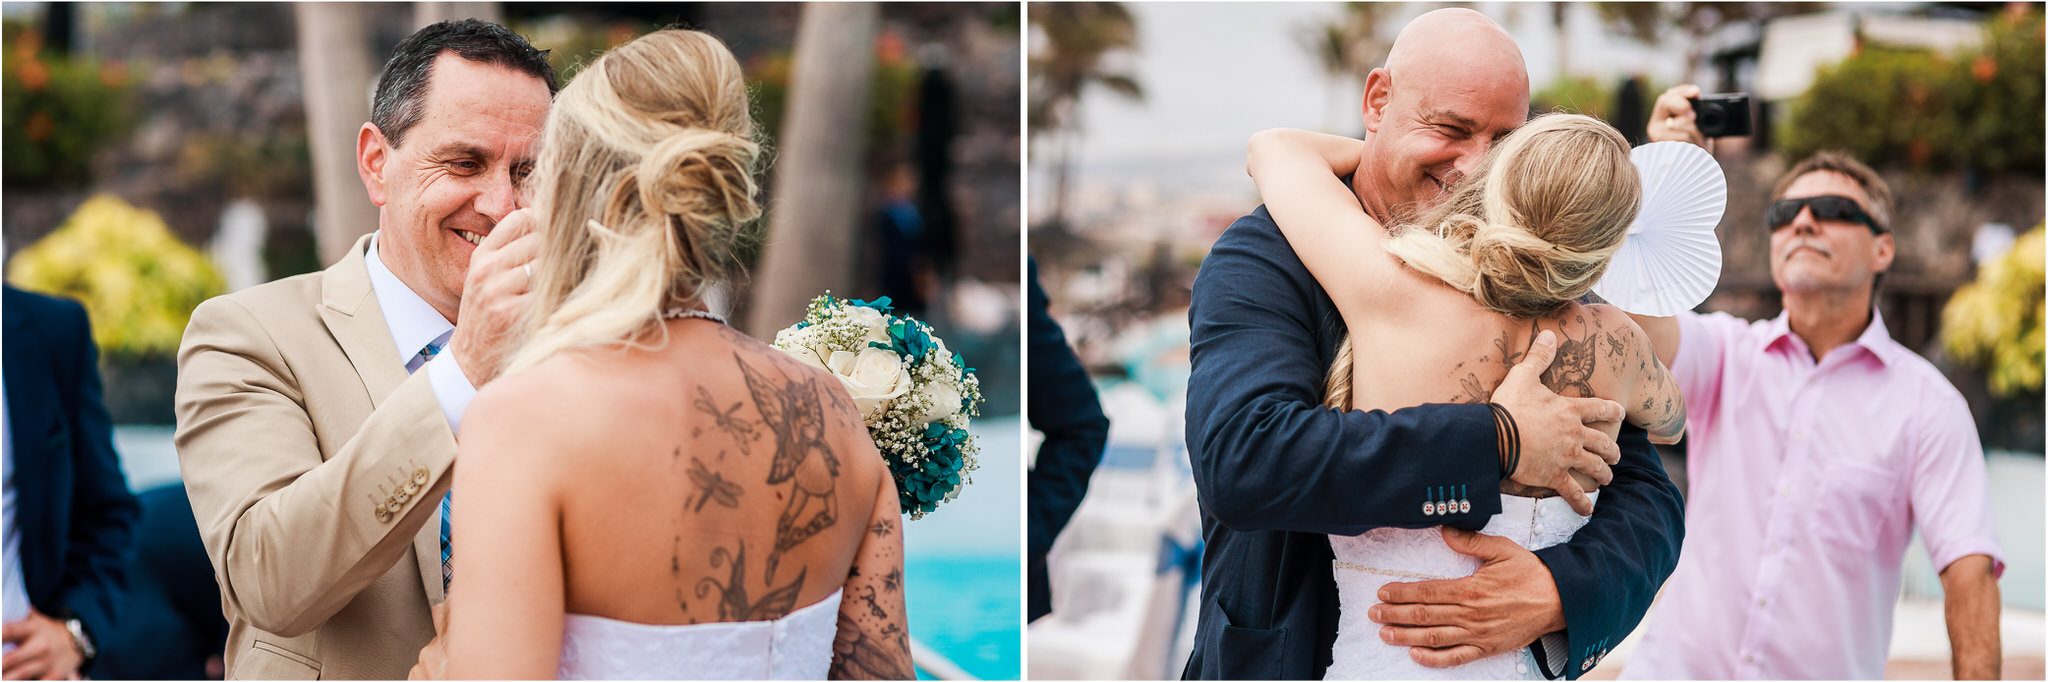 Hochzeitsfoto-Teneriffa-31.jpg